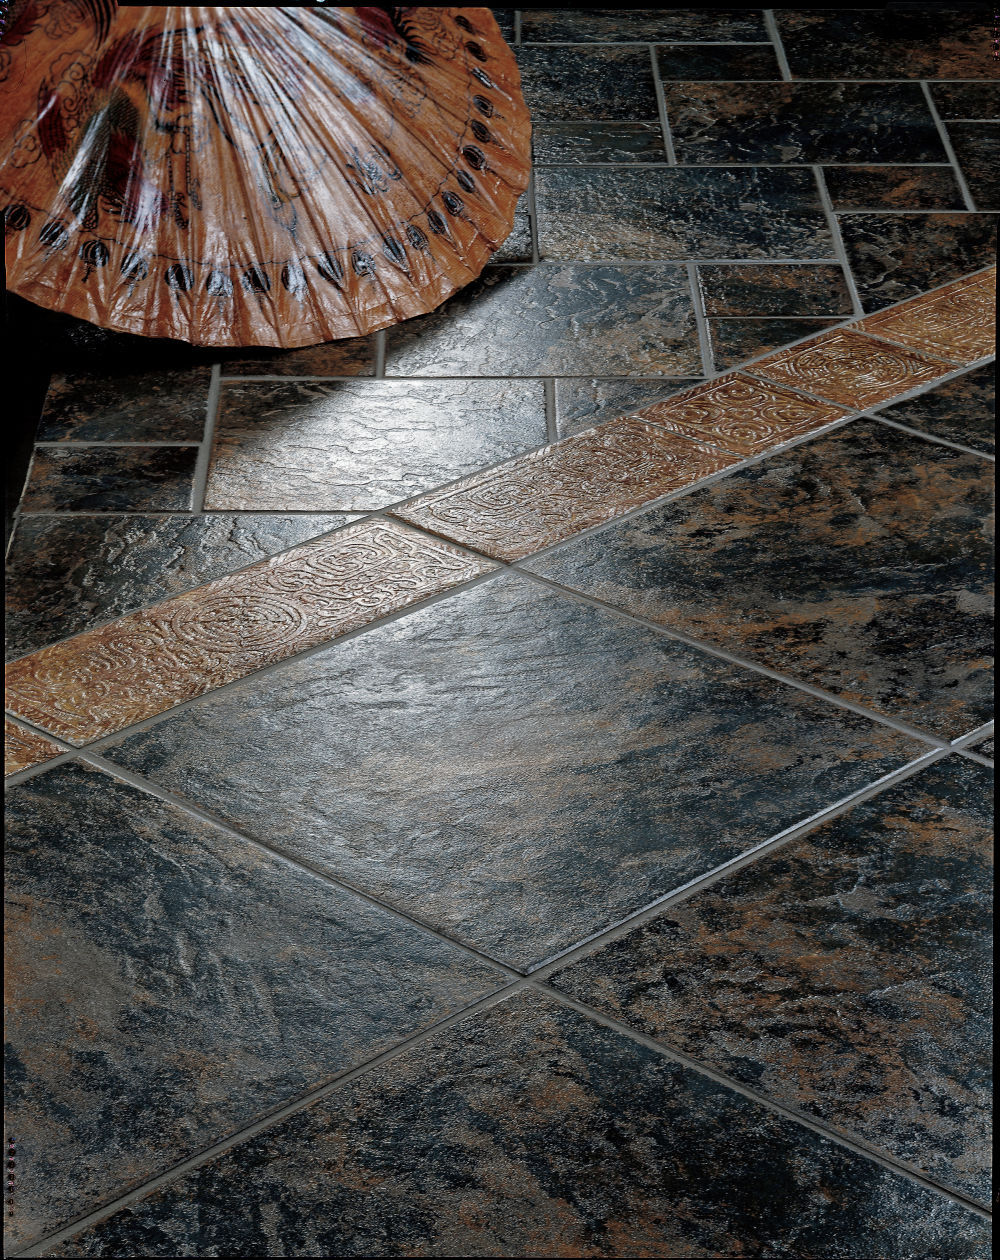 Indoor Tile / Floor / Porcelain Stoneware / Enameled   RUSTIC : ASIA